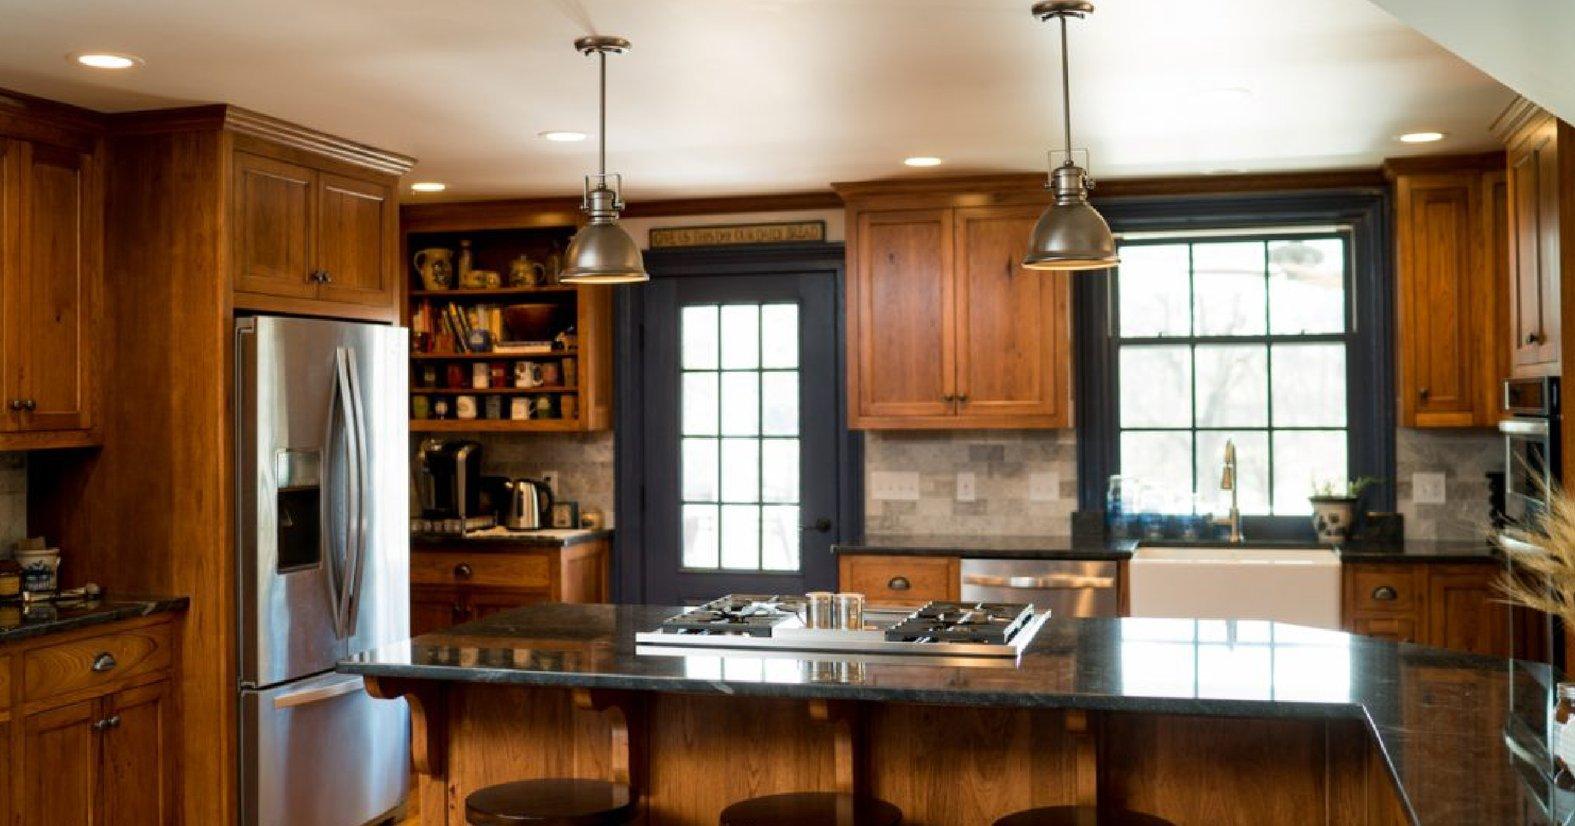 integrity-homes-kitchen-02.jpg